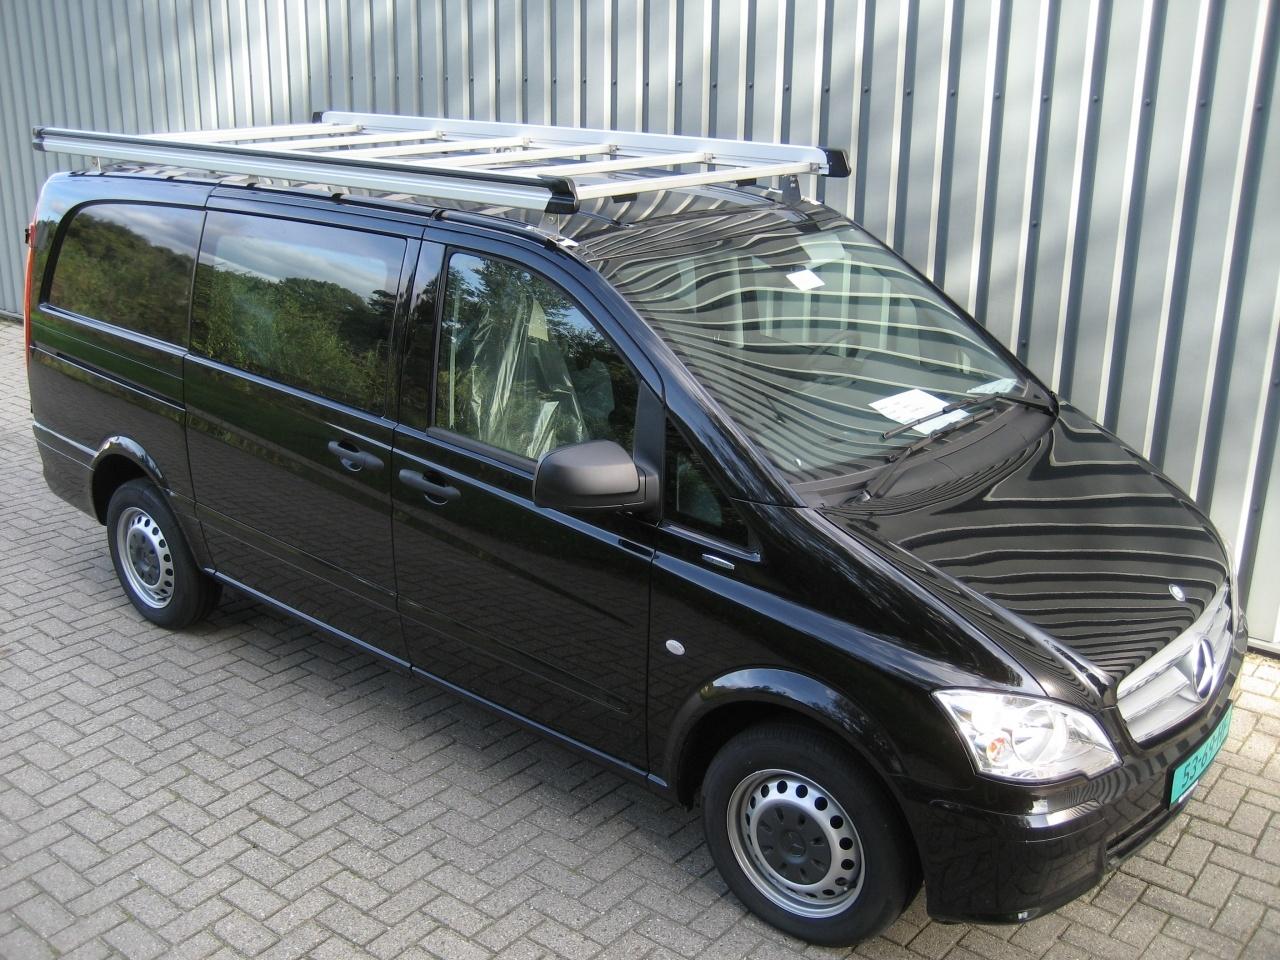 Aluminium imperiaal Mercedes Vito 2004 - 2014 L1 H1 met achterdeuren inclusief opsteekrol